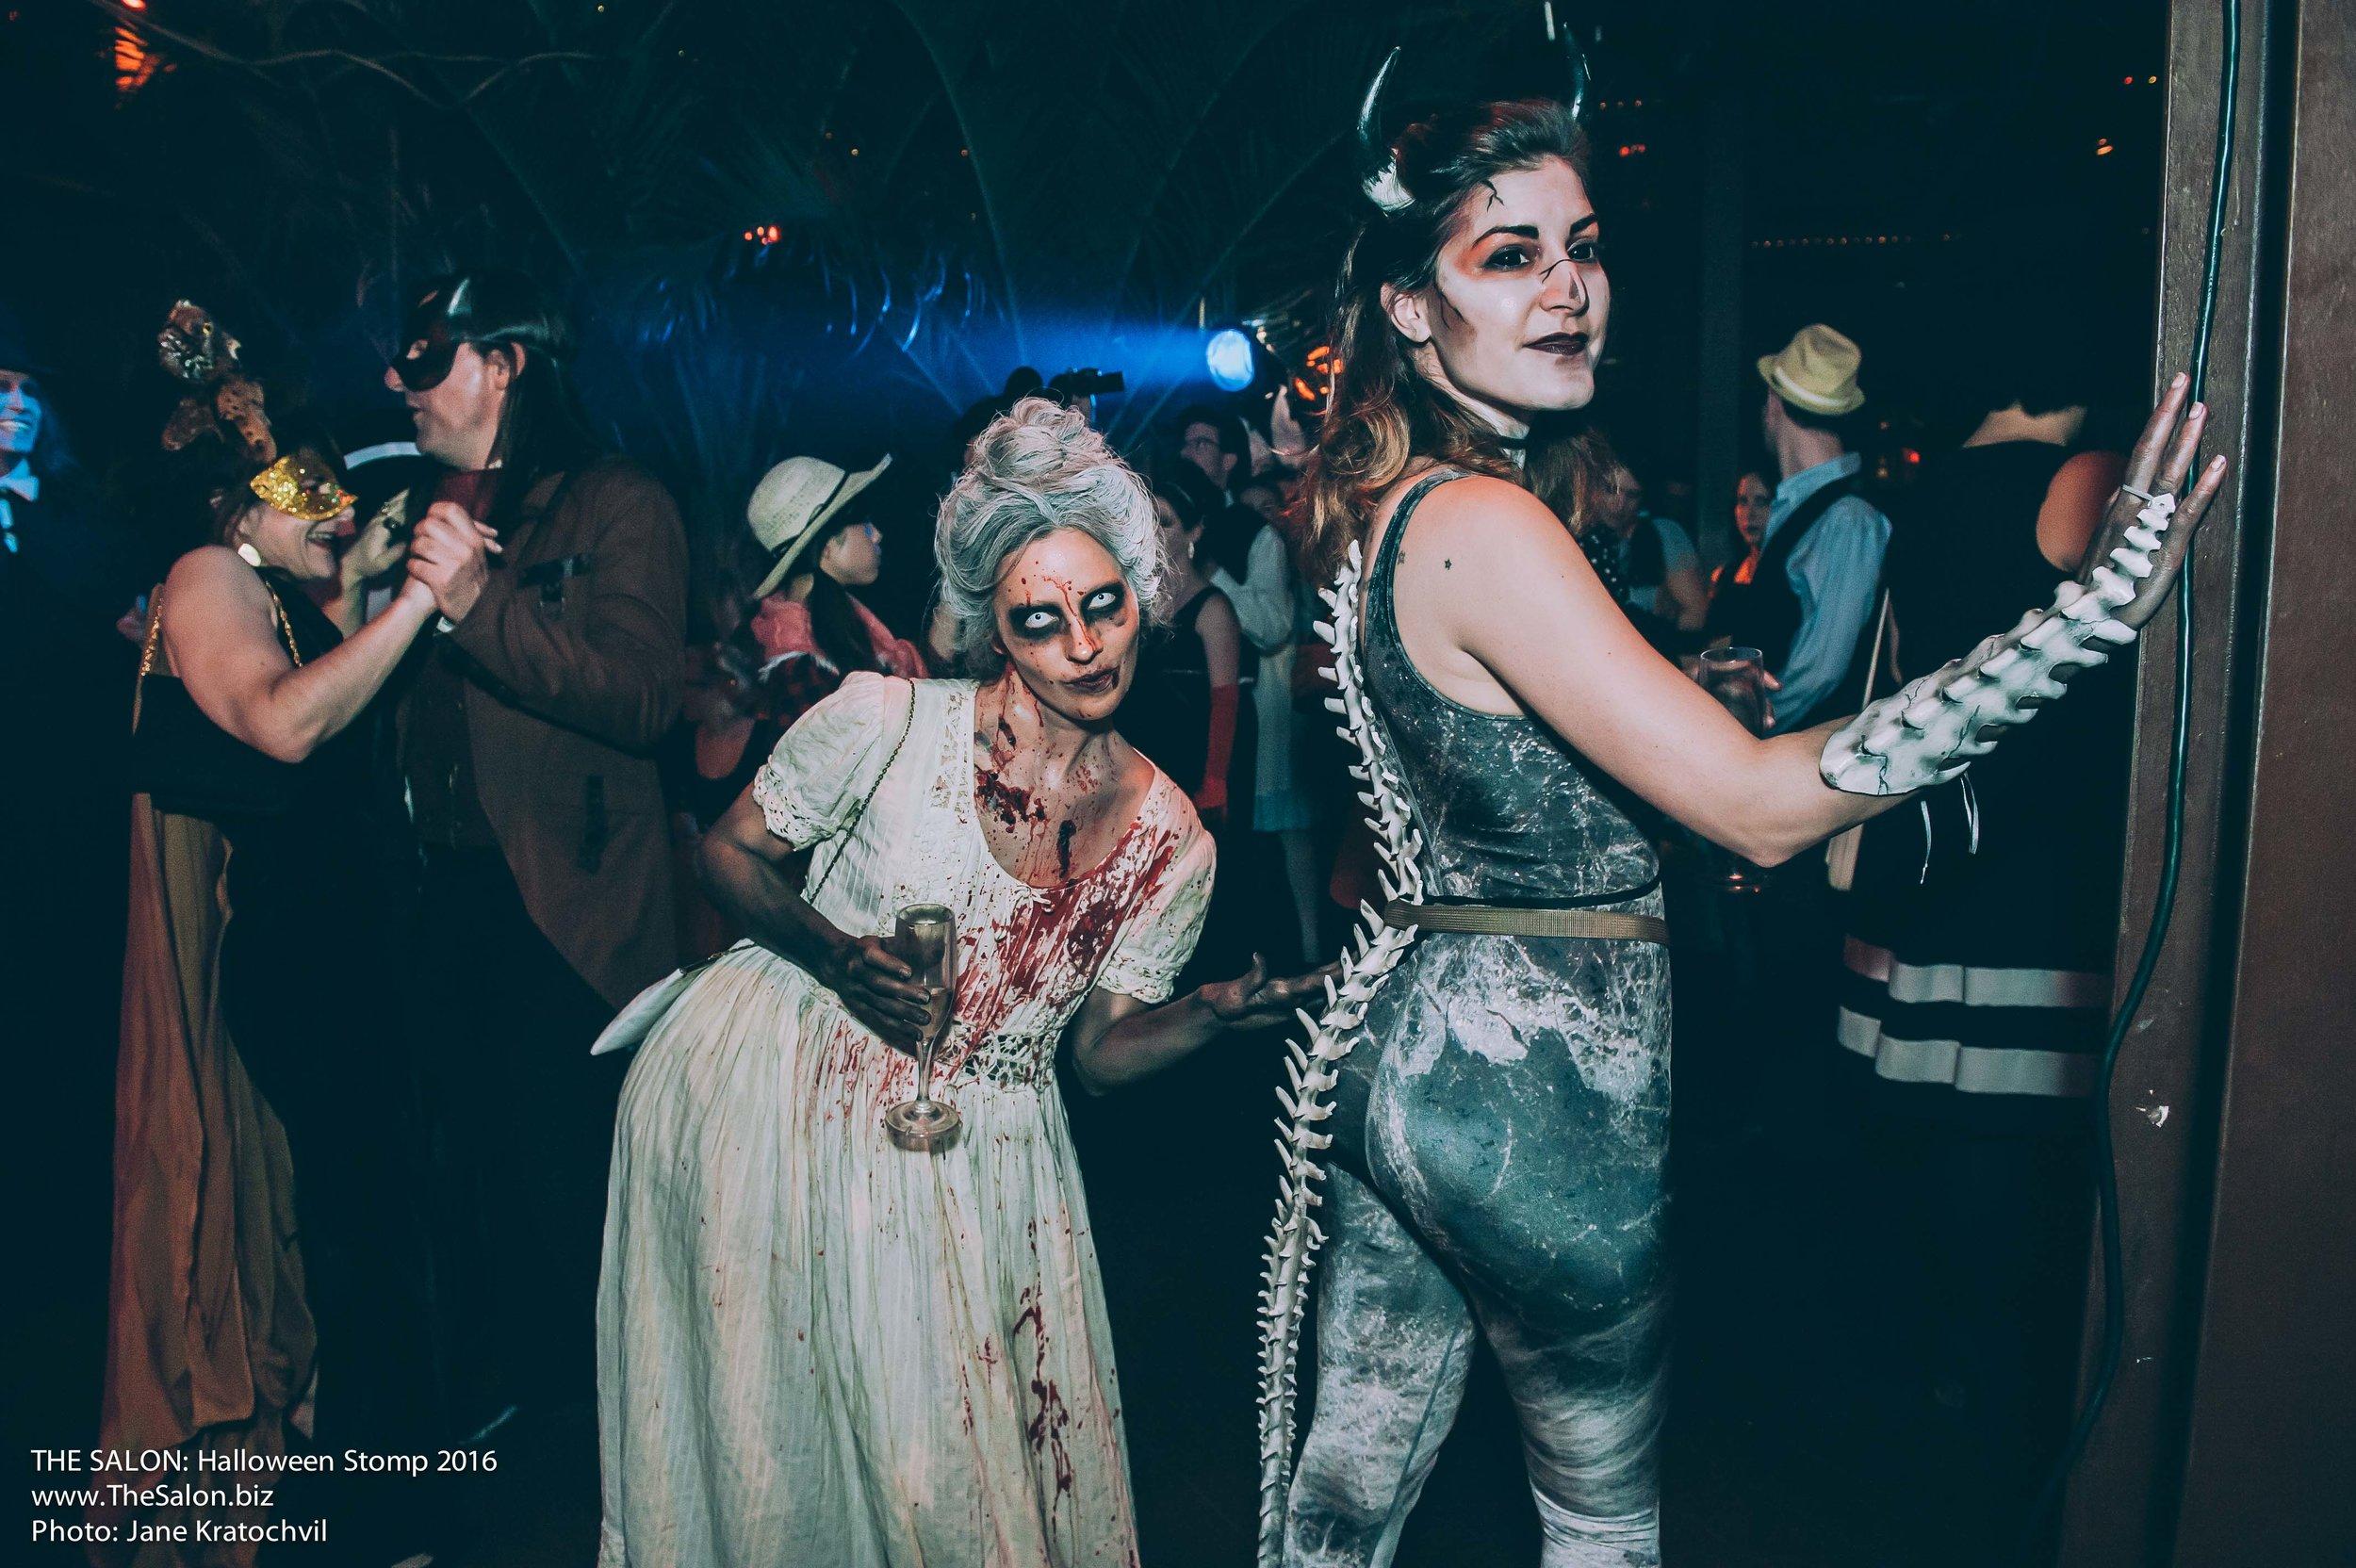 THE-SALON_HalloweenStomp16__photocredit-jane-kratochvil__0724.jpg